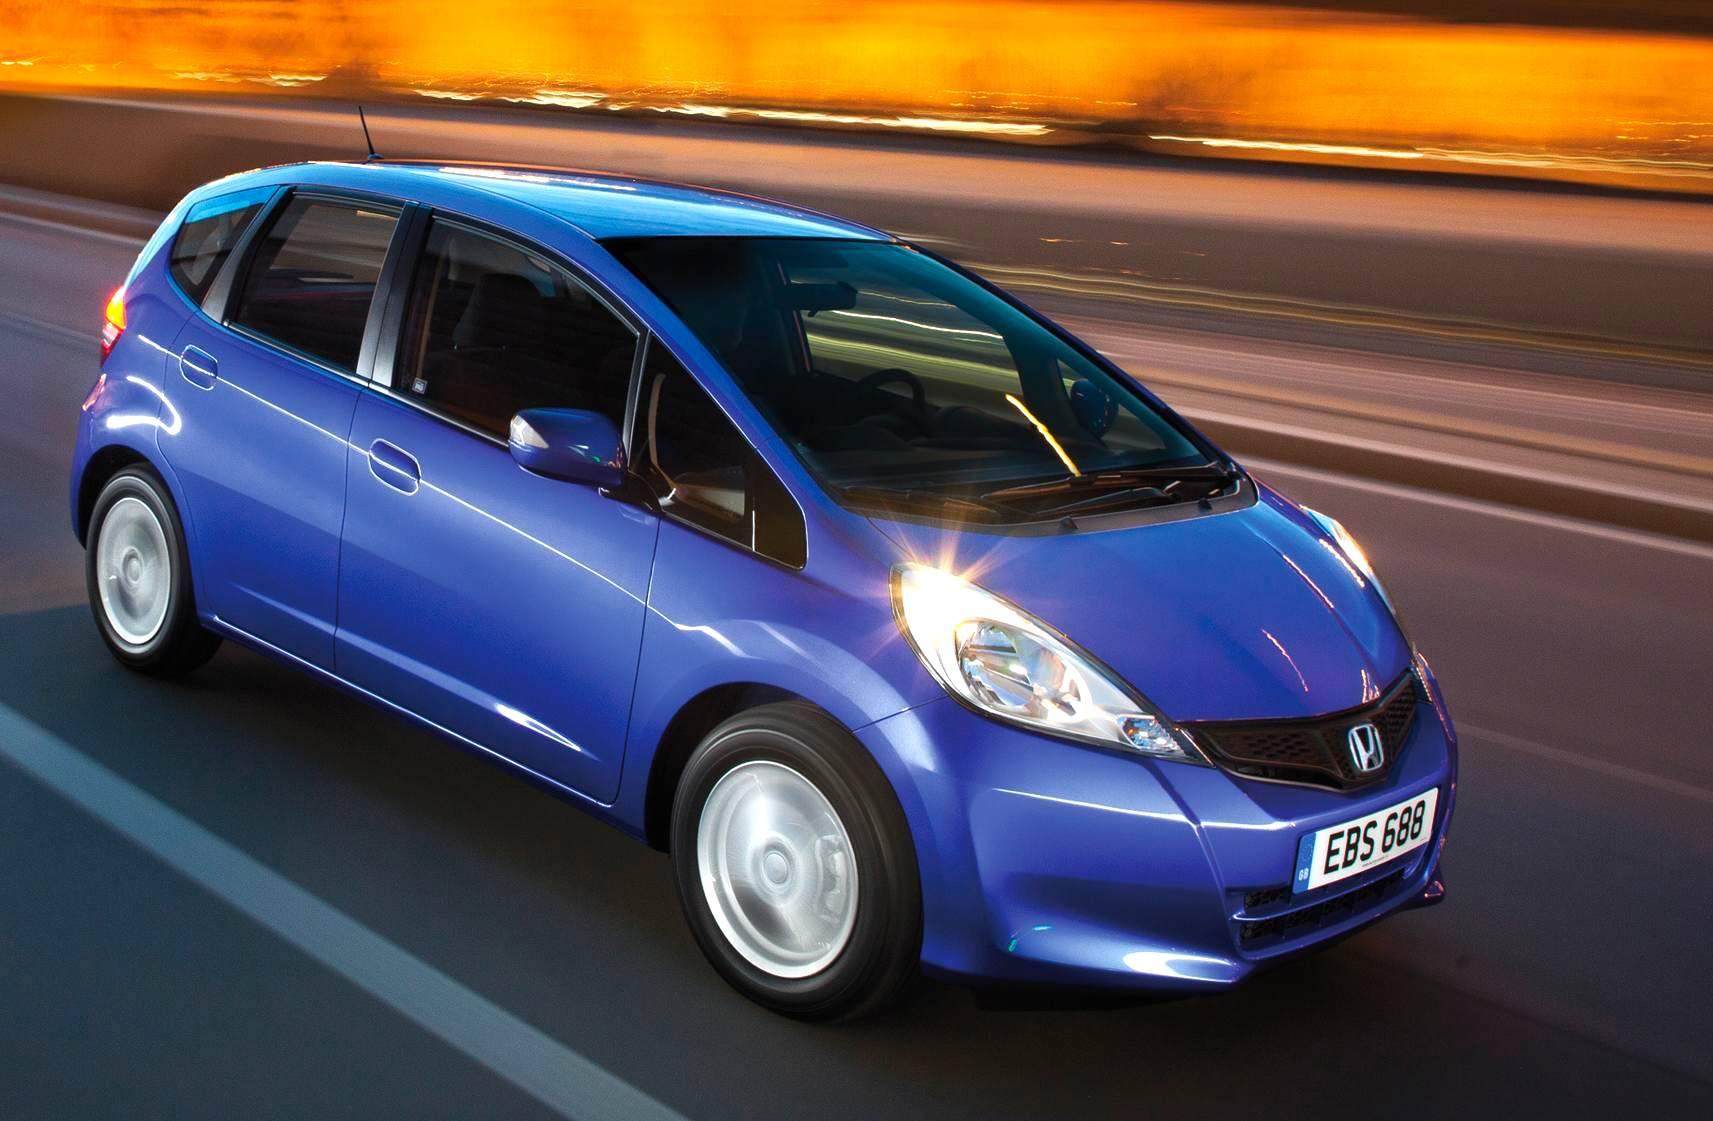 Honda Best Selling Cars Matts Blog